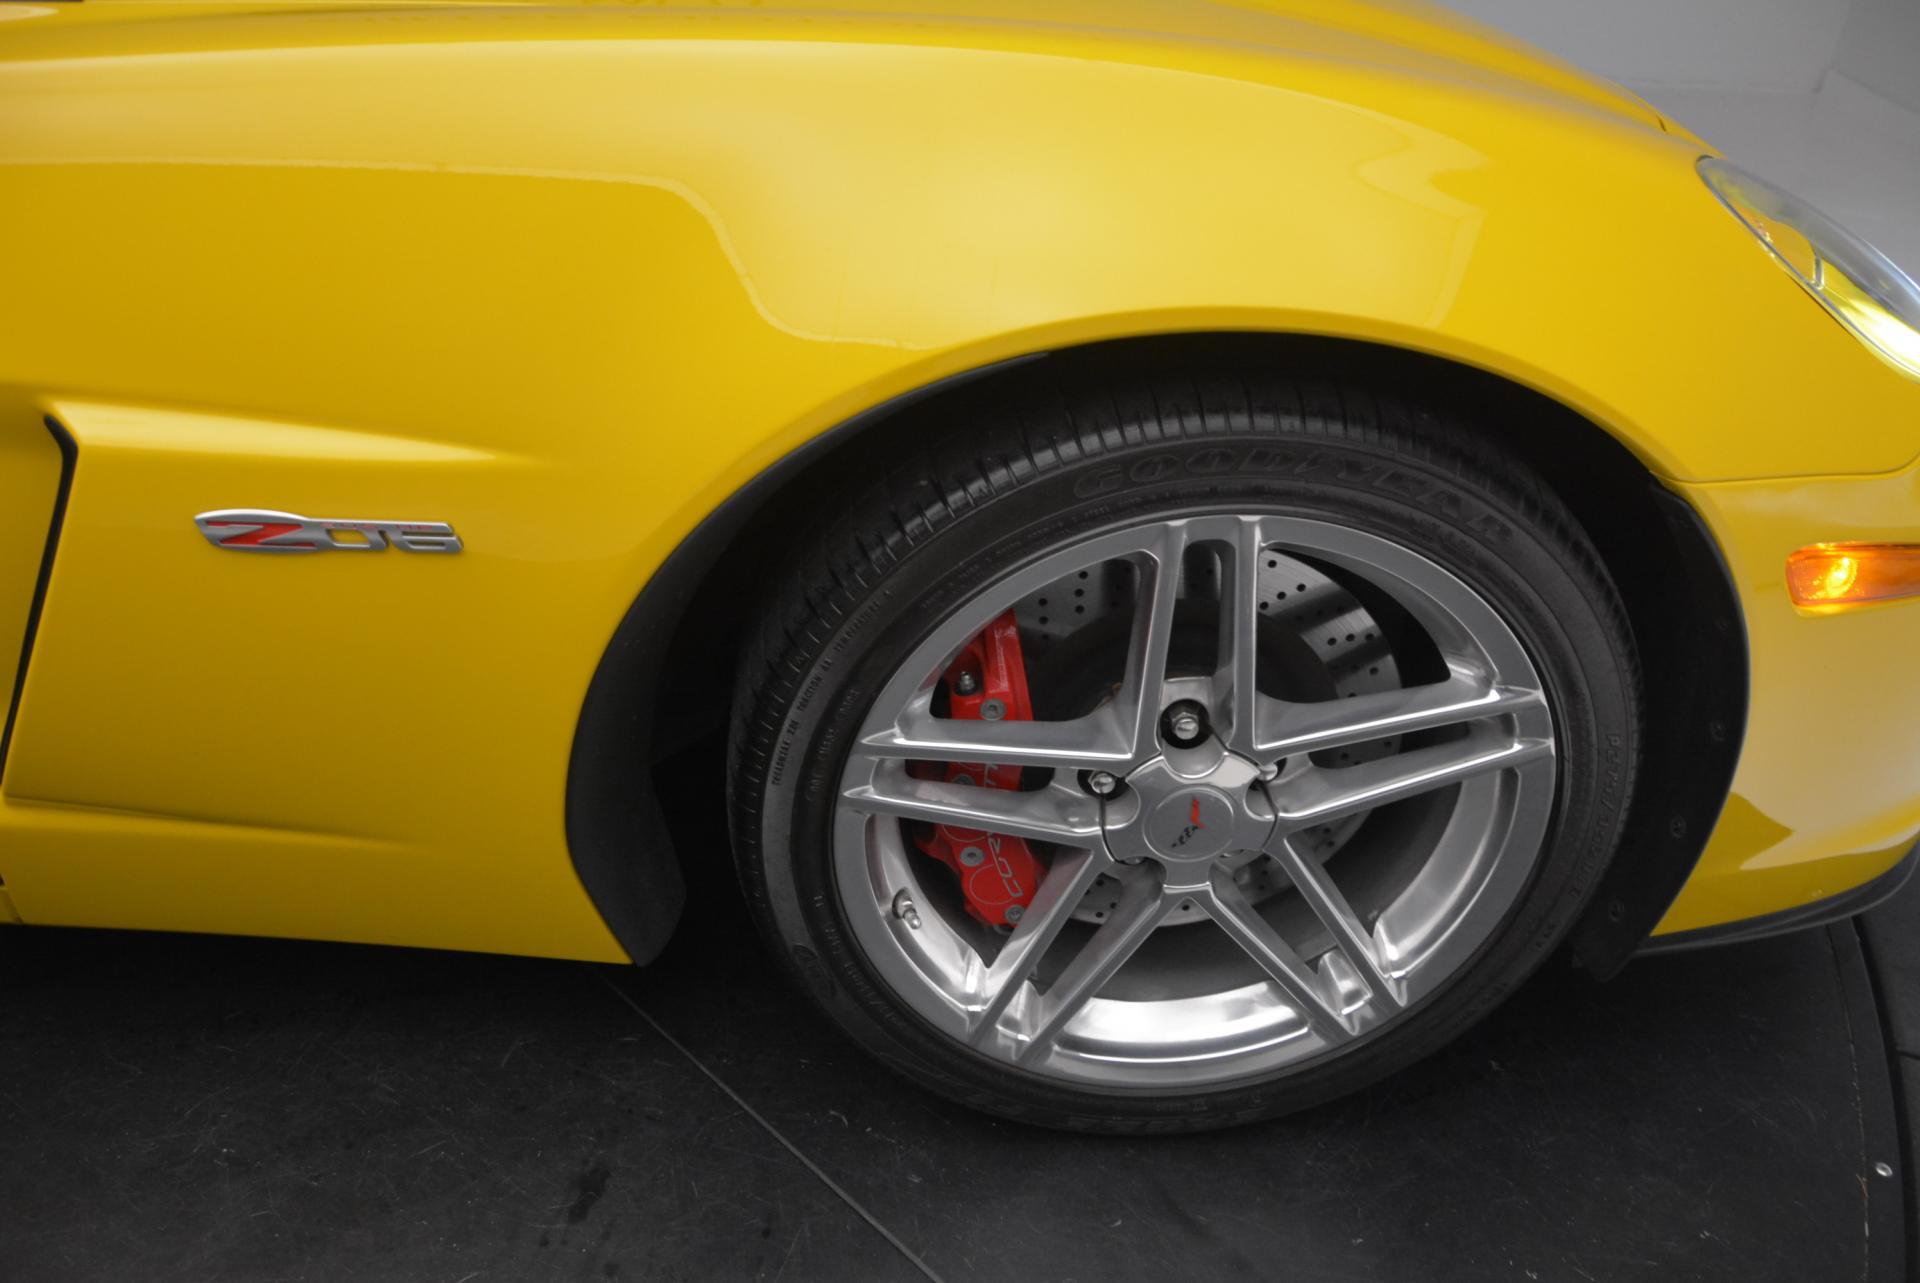 Used 2006 Chevrolet Corvette Z06 Hardtop For Sale In Greenwich, CT 530_p18